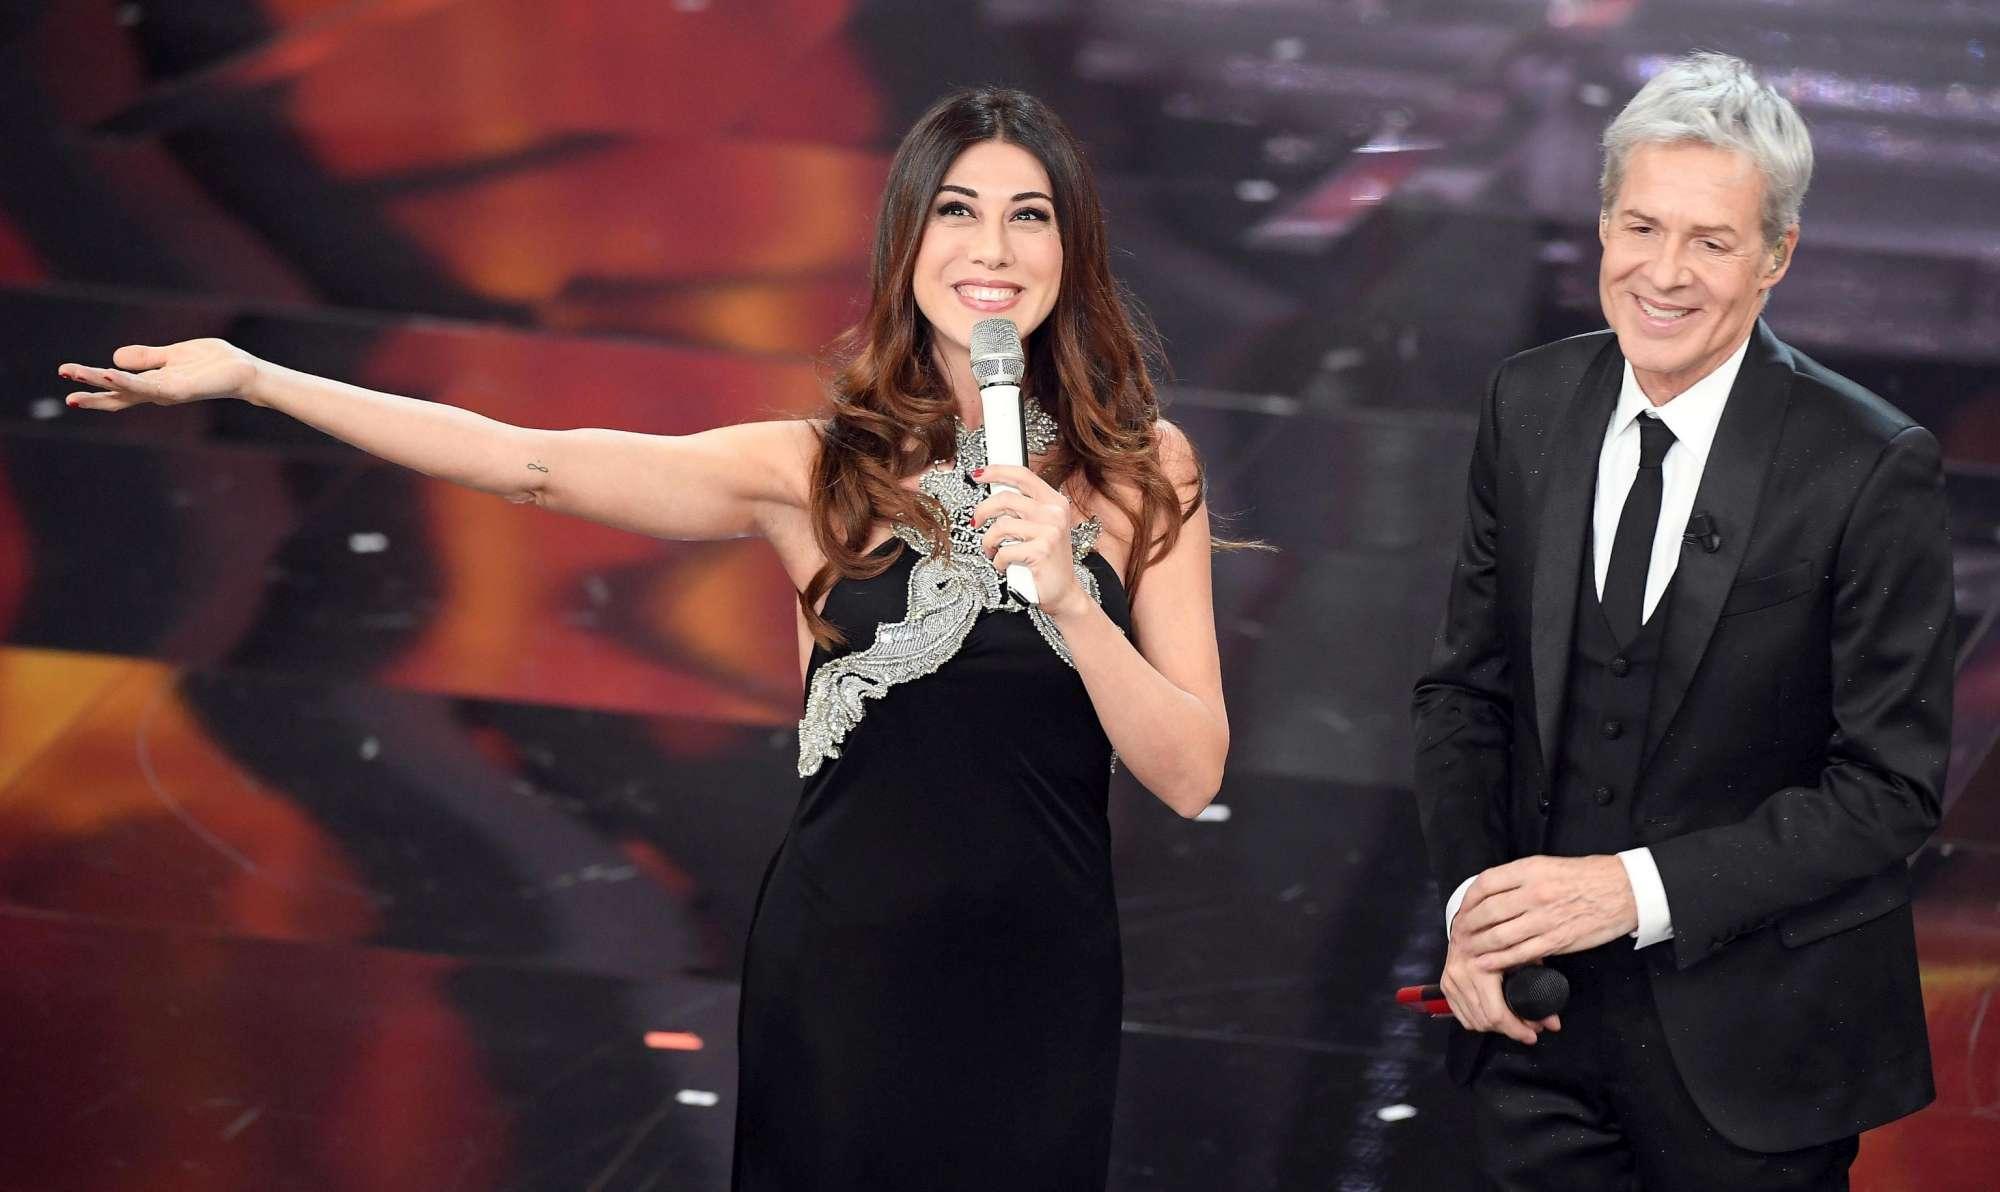 Sanremo 2018, Virginia Raffaele ospite a sorpresa